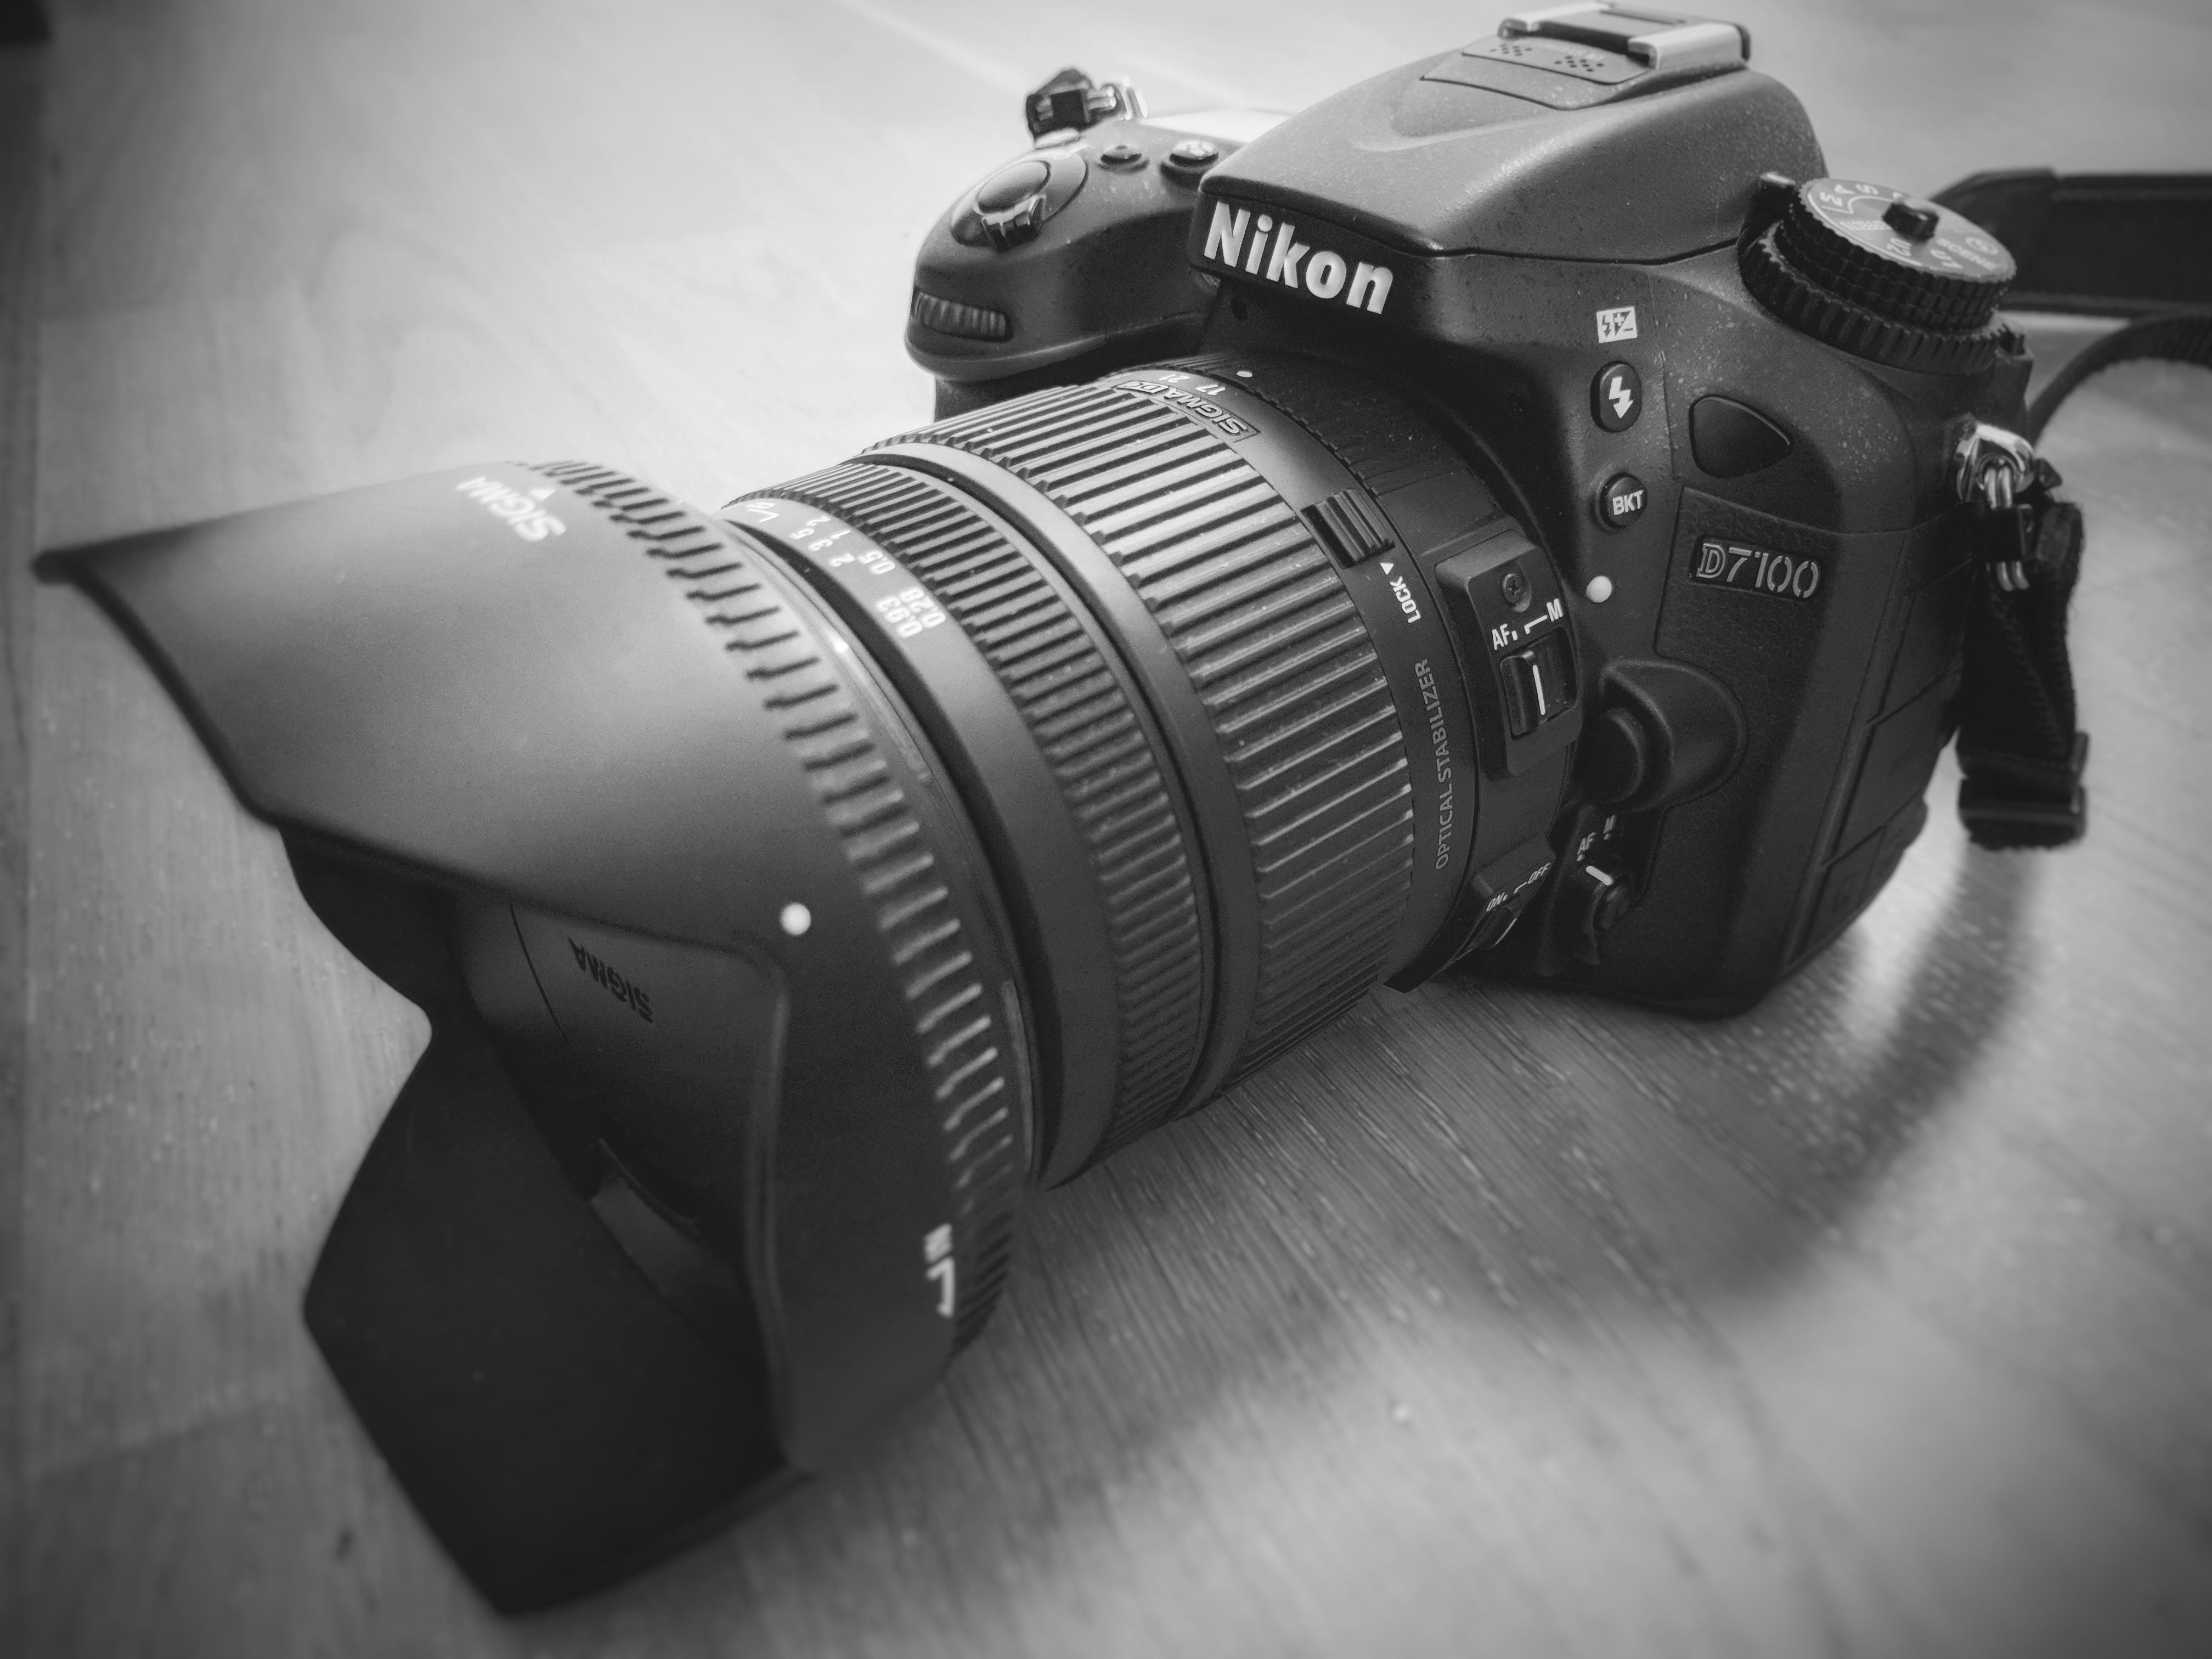 Meine Kamera-Objektiv-Kombi auf Reisen | Imrazor.de